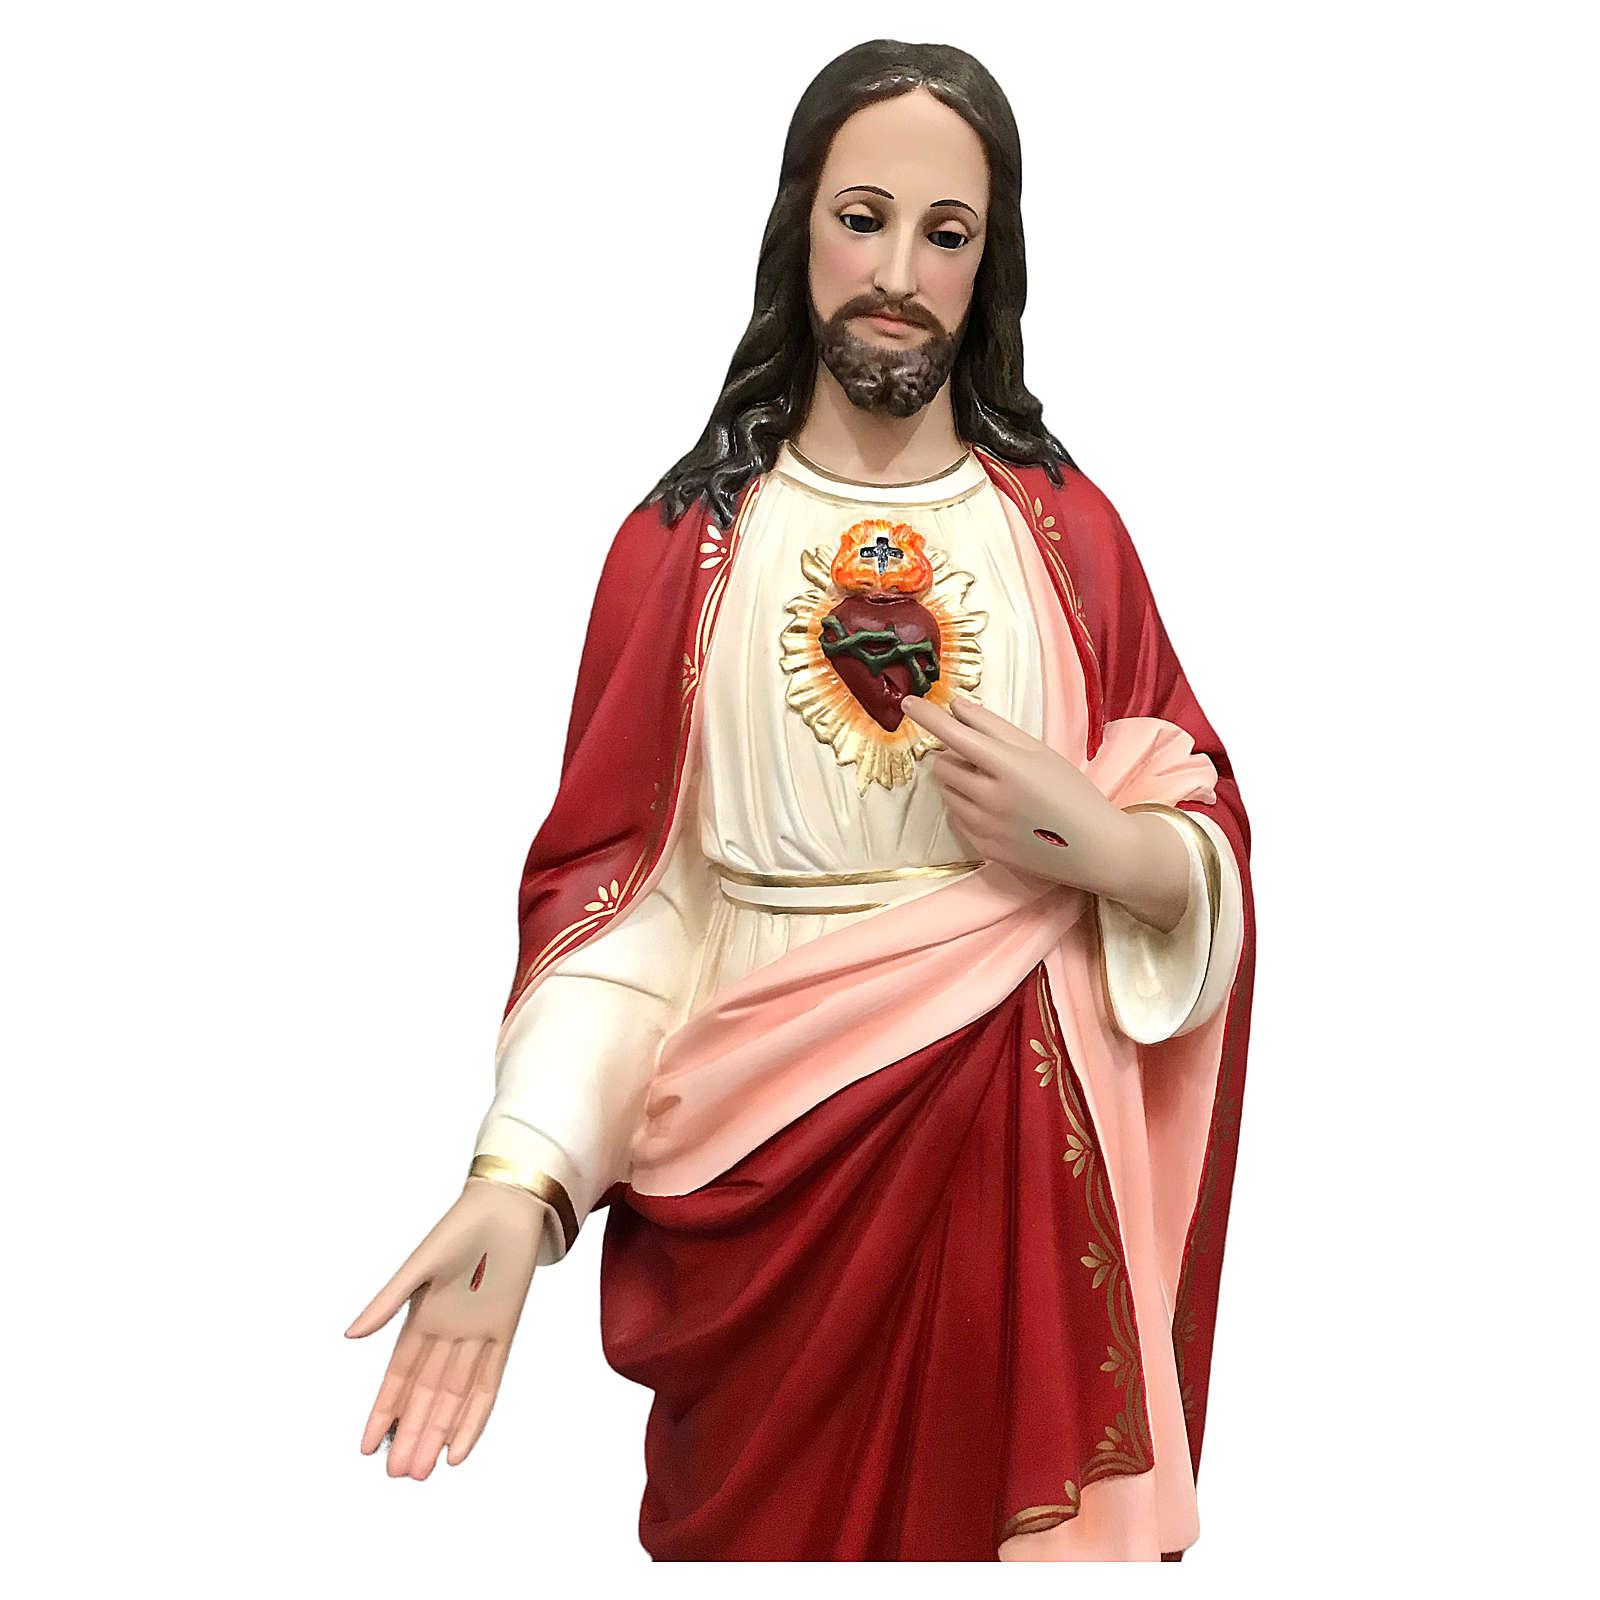 Statua Gesù Sacro Cuore 85 cm vetroresina dipinta occhi vetro 4